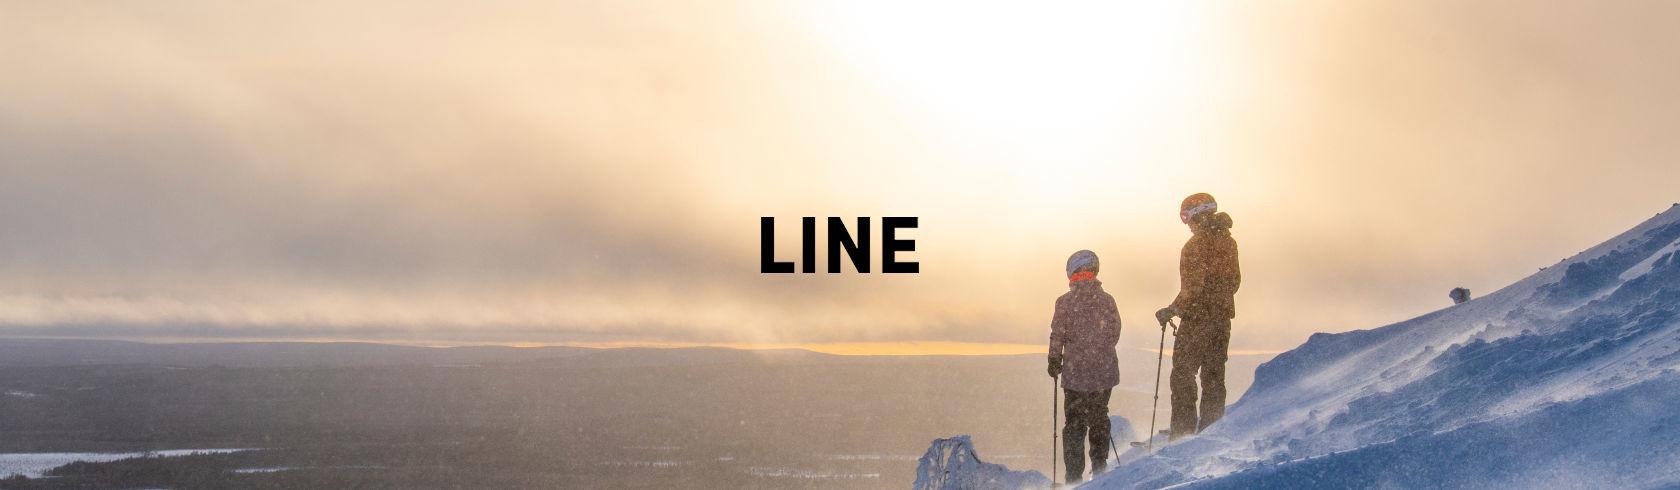 Line Skis brand logo